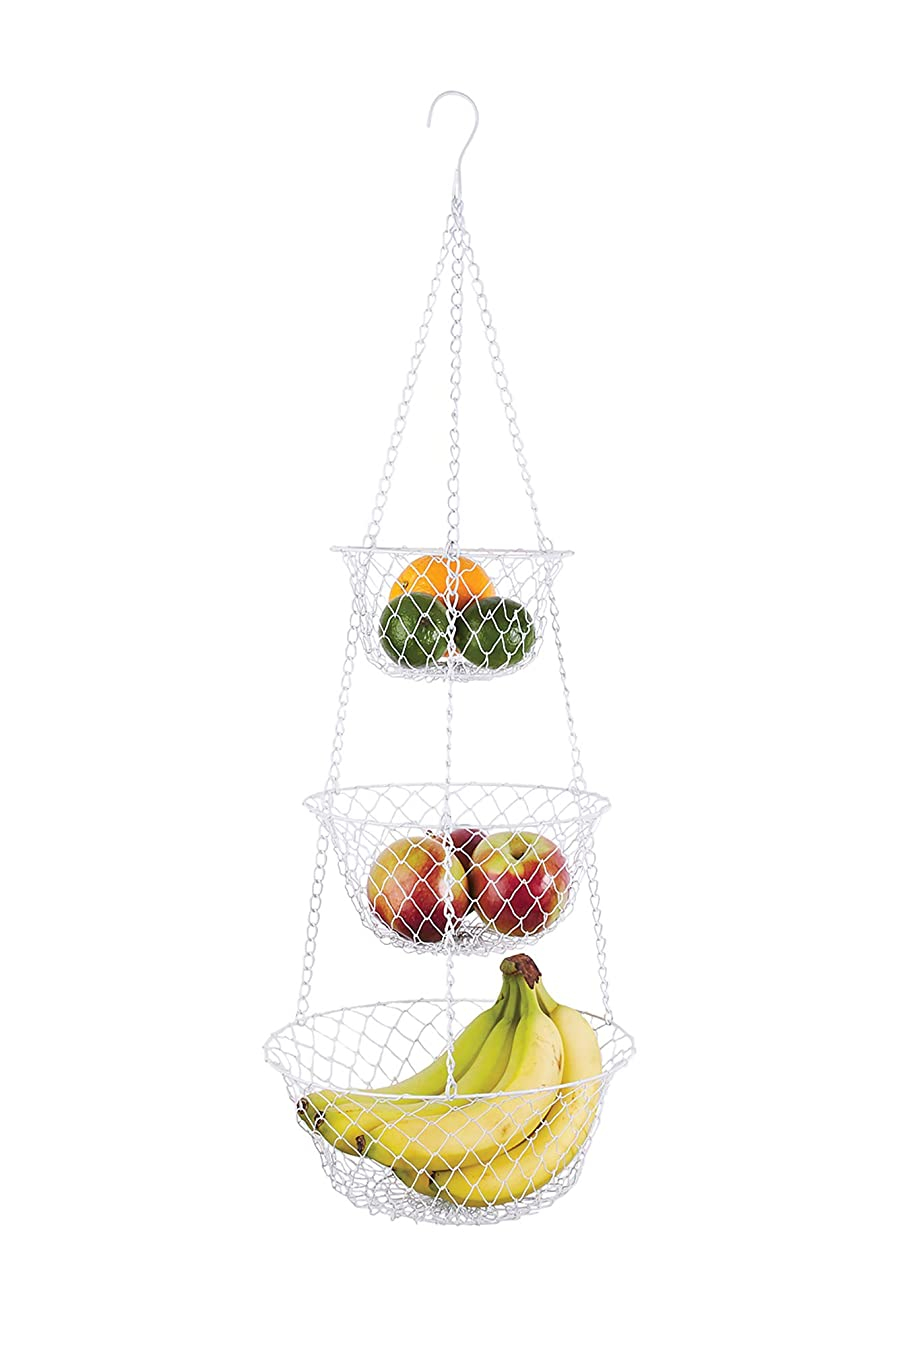 Fox Run Brands 3 Tier Hanging Fruit Vegetable Kitchen Storage Mesh Basket - Various Colors